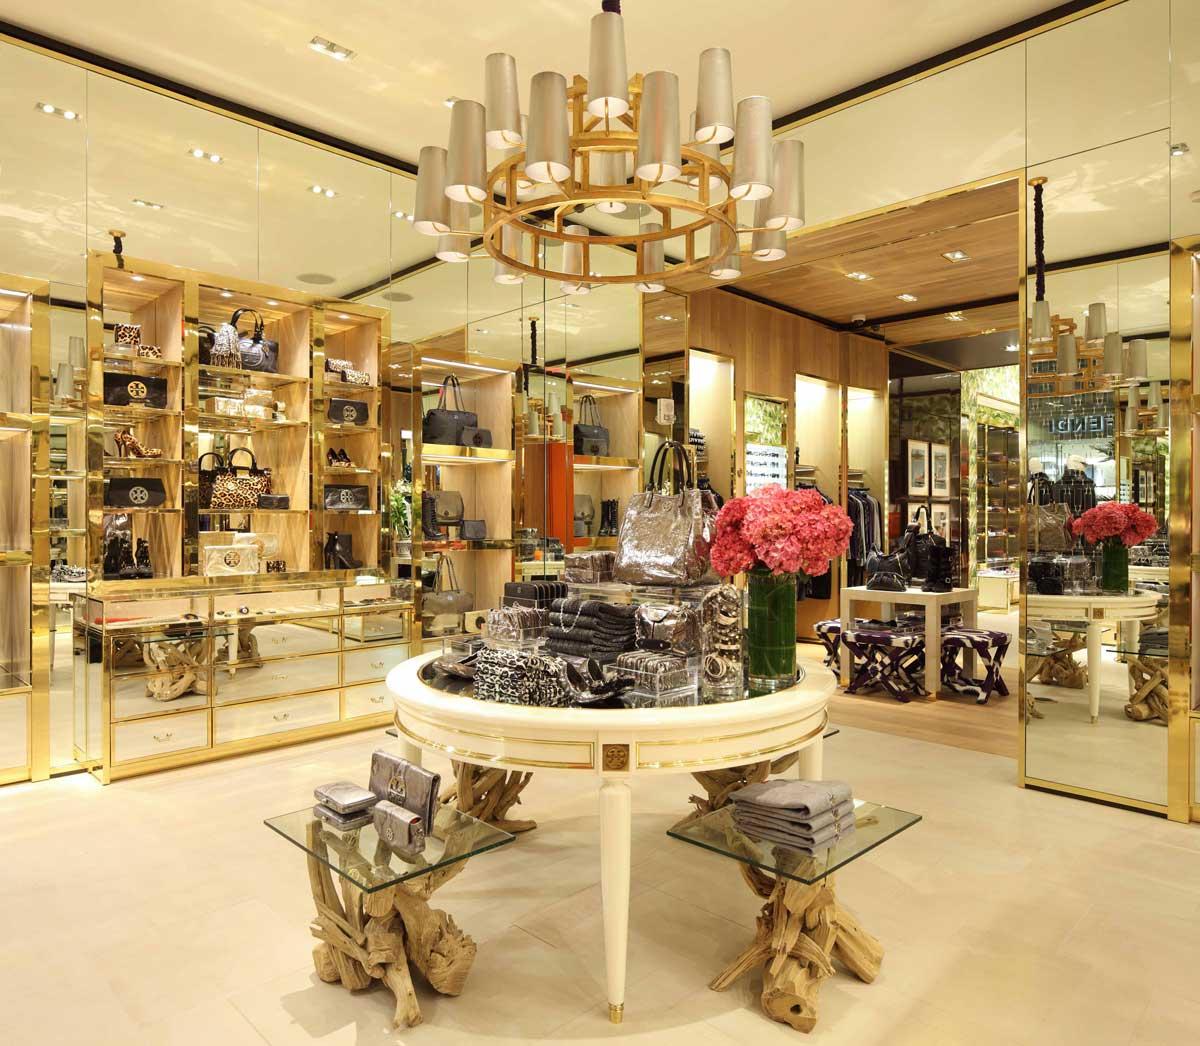 Tory Burch store interior